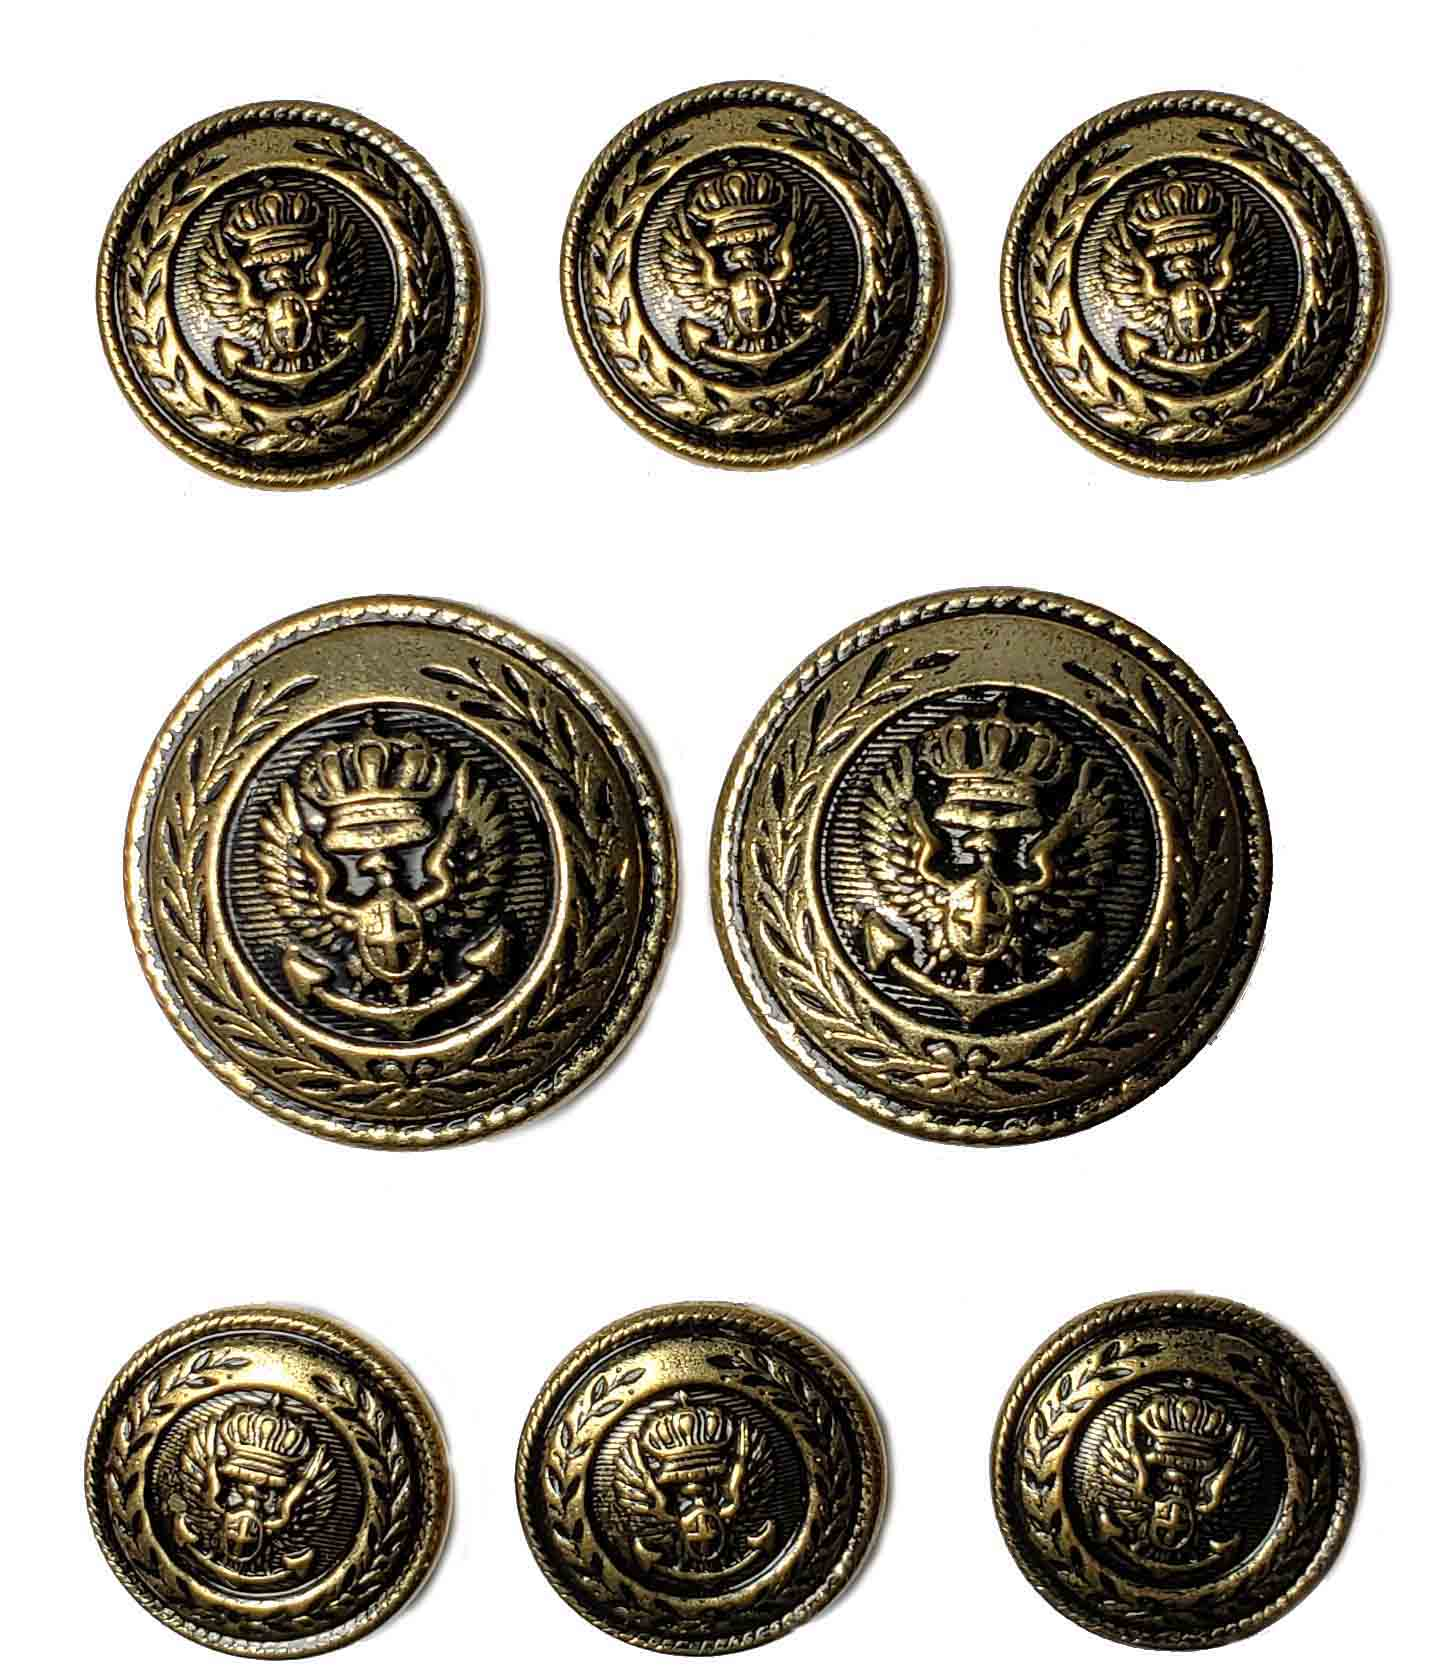 Waterbury Blazer Buttons Set Antique Gold Brass Crown Wheat Eagle Shank Men's